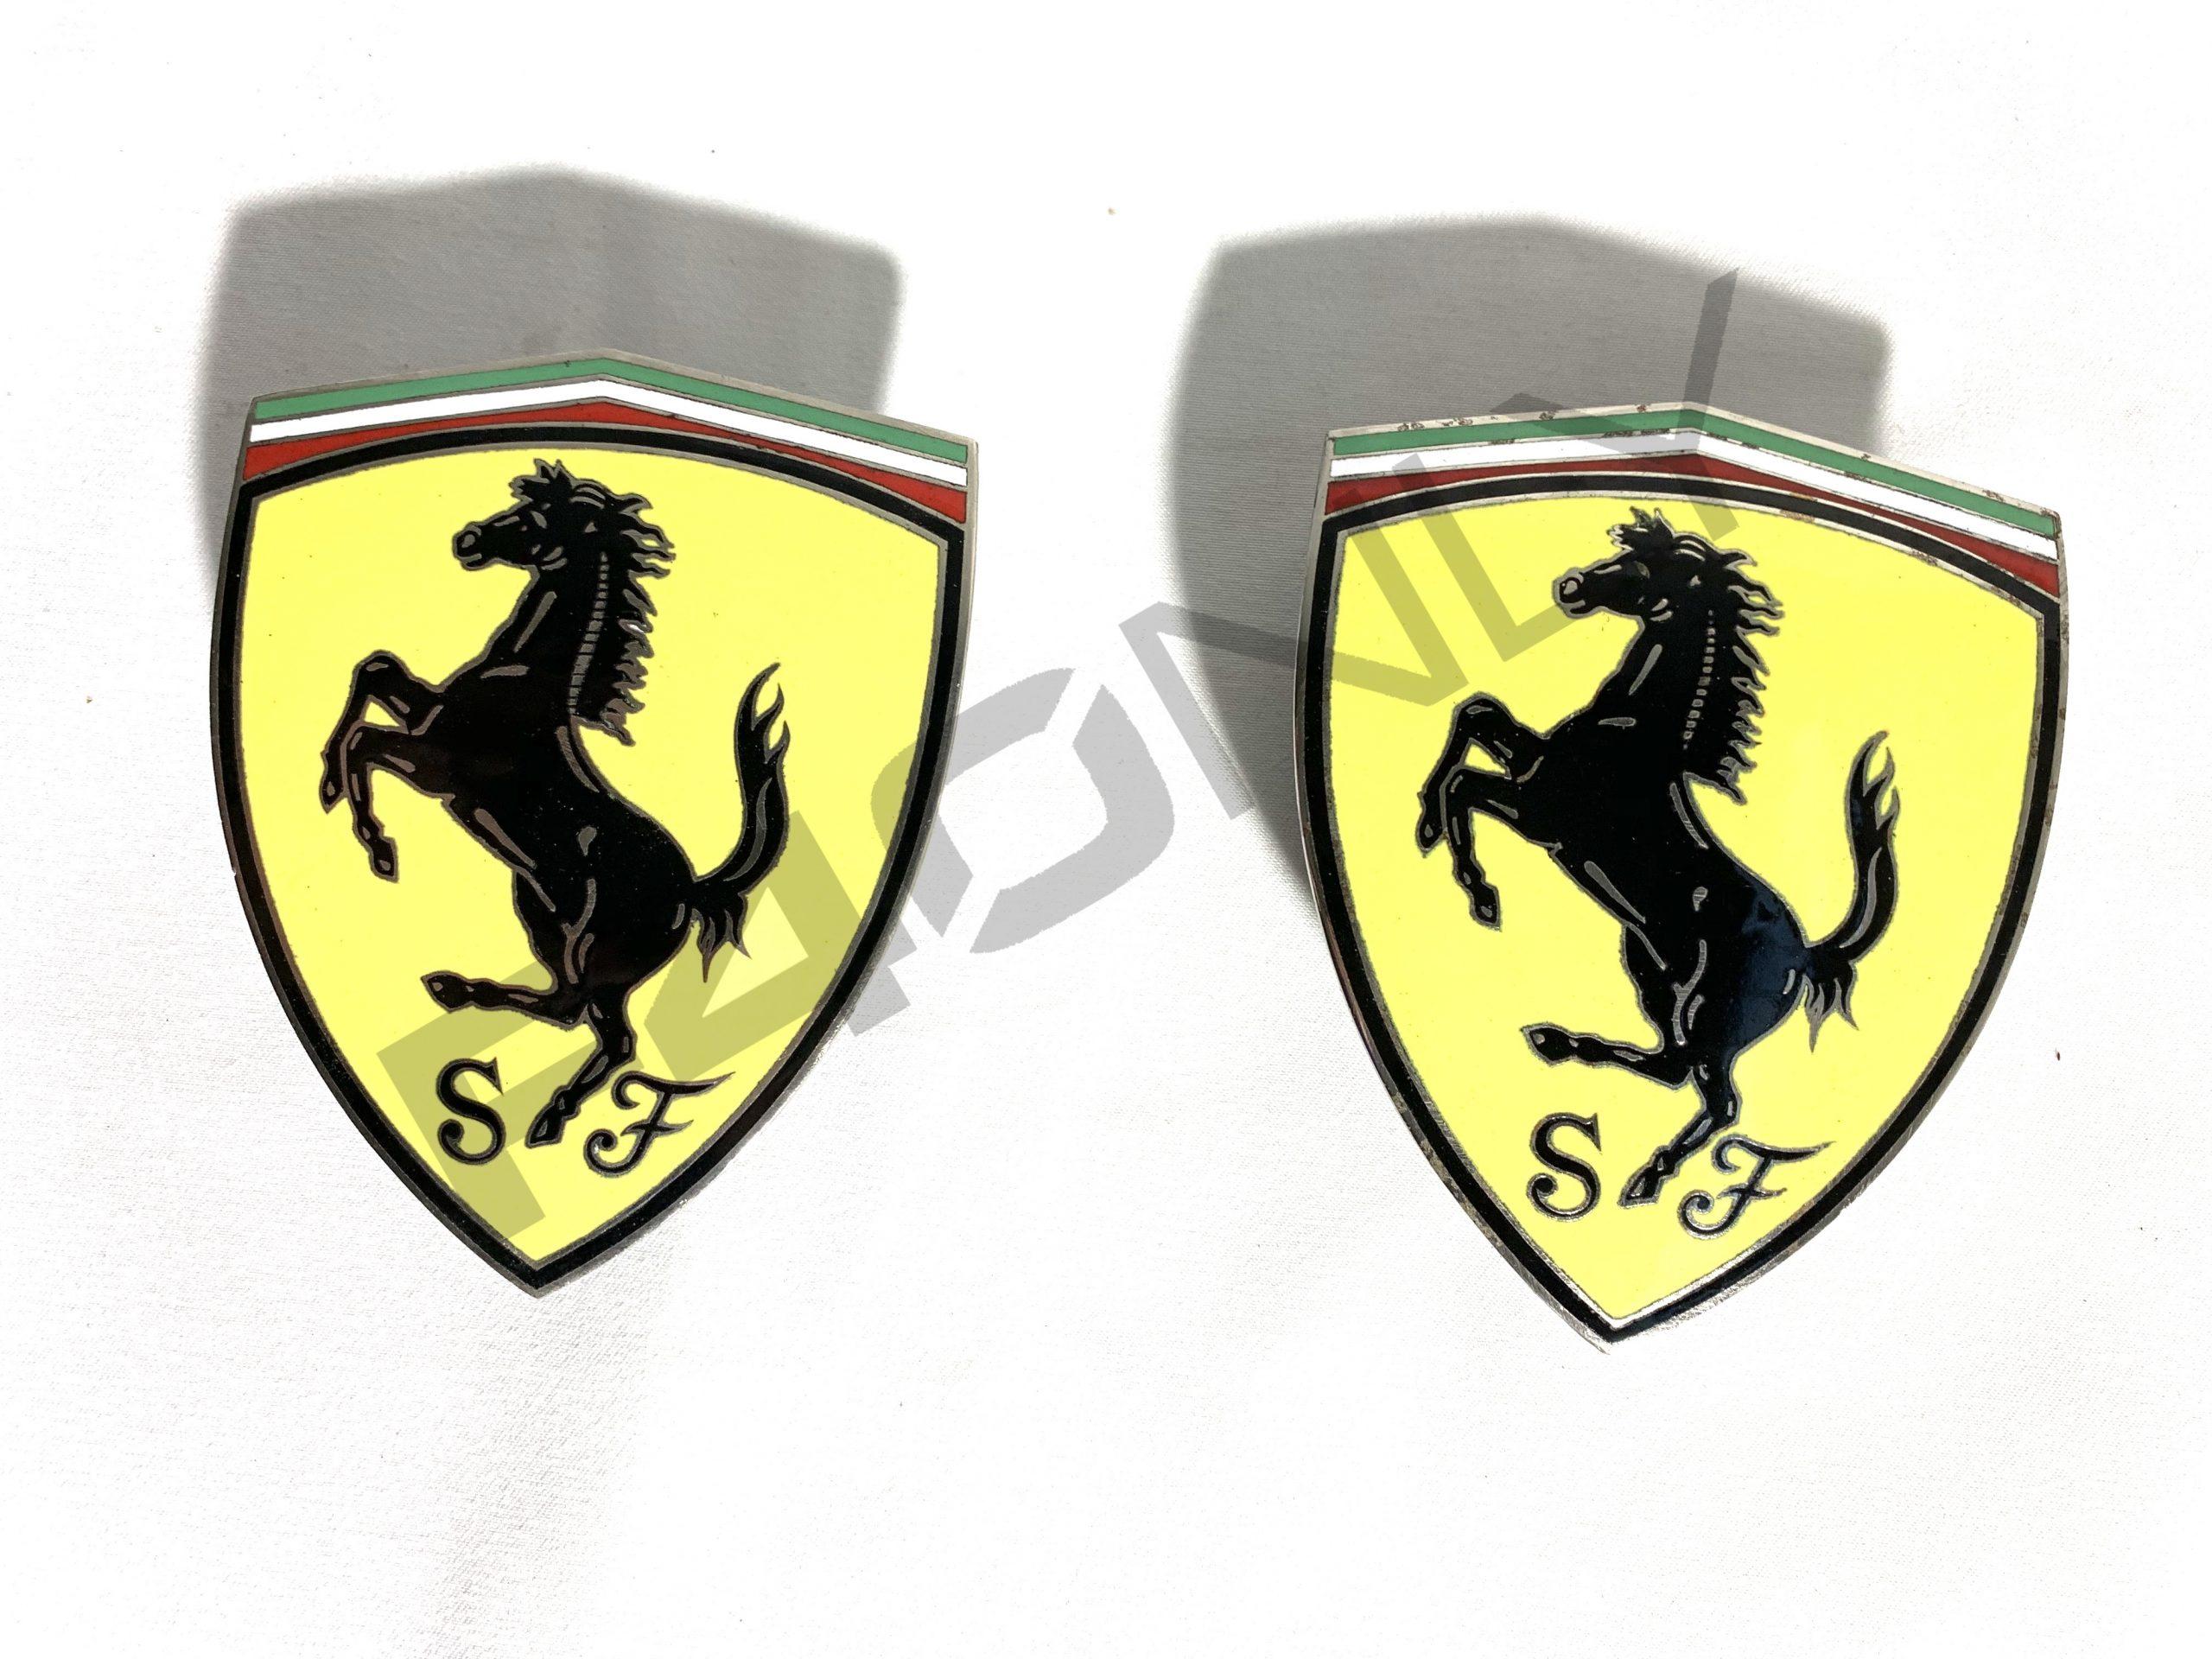 R.H. and L.H. Emblem Image